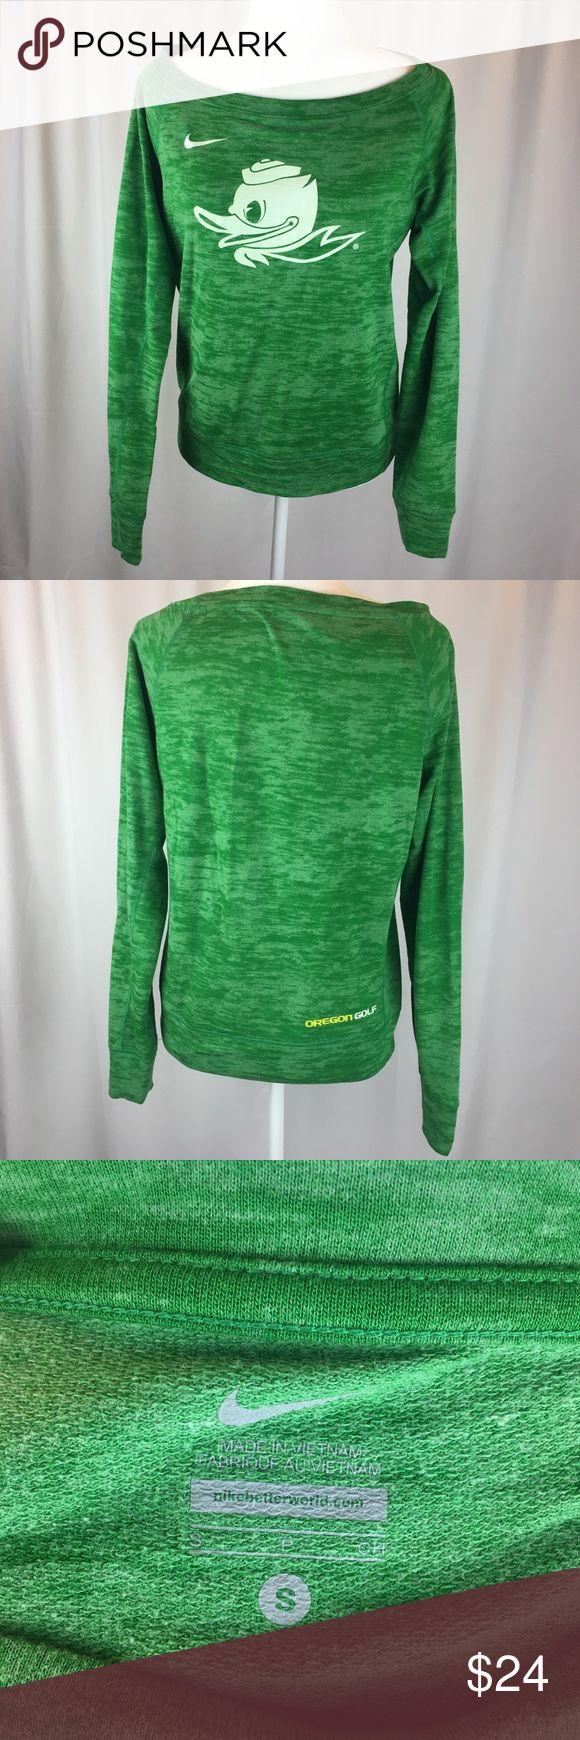 Nike Oregon Ducks Women S Boatneck Sweatshirt Sweatshirts Clothes Design Oregon Ducks [ 1740 x 580 Pixel ]